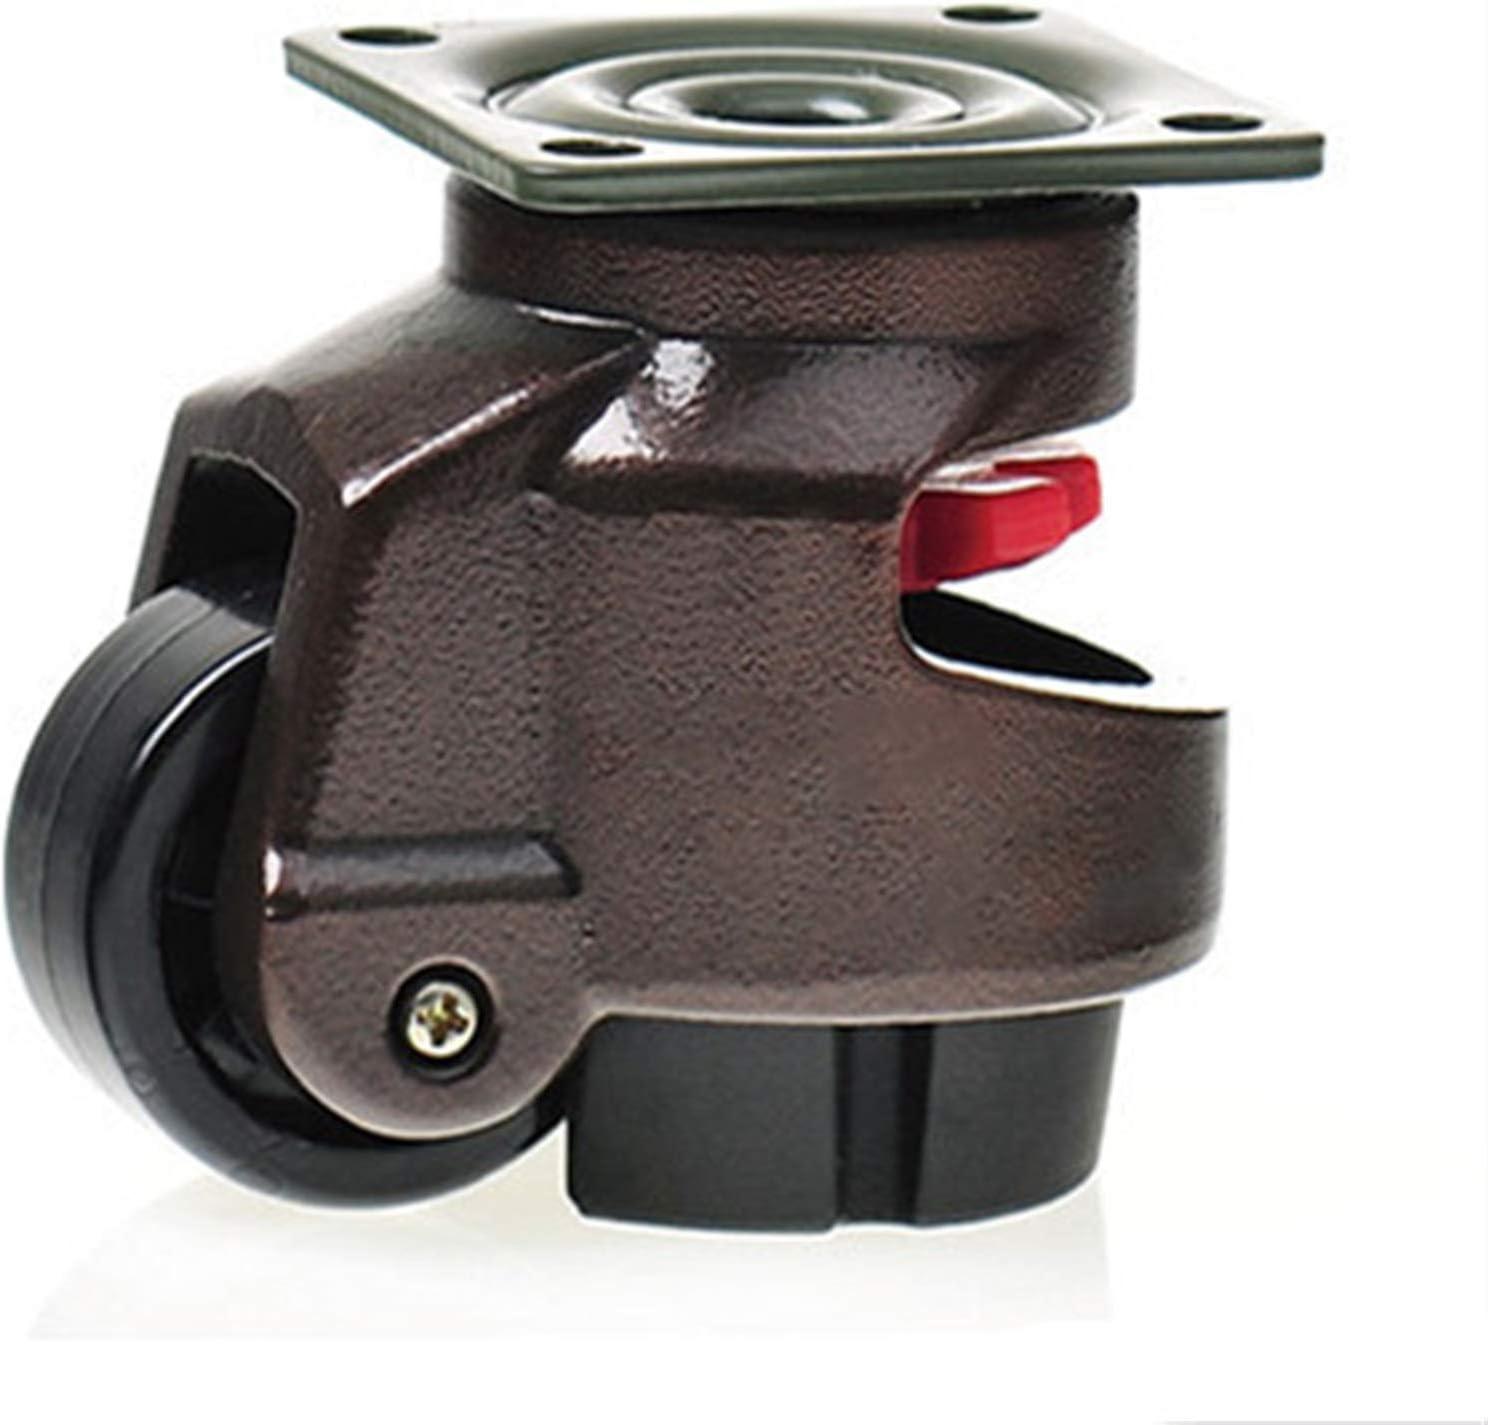 Silenciosas deslizamientos suelos de madera dura GD-40F / 60F / 80F, ruedas de ruedas Rueda de ajuste de nivel de servicio pesado / ruedas, soporte plano, para máquinas expendedoras de equipos grandes